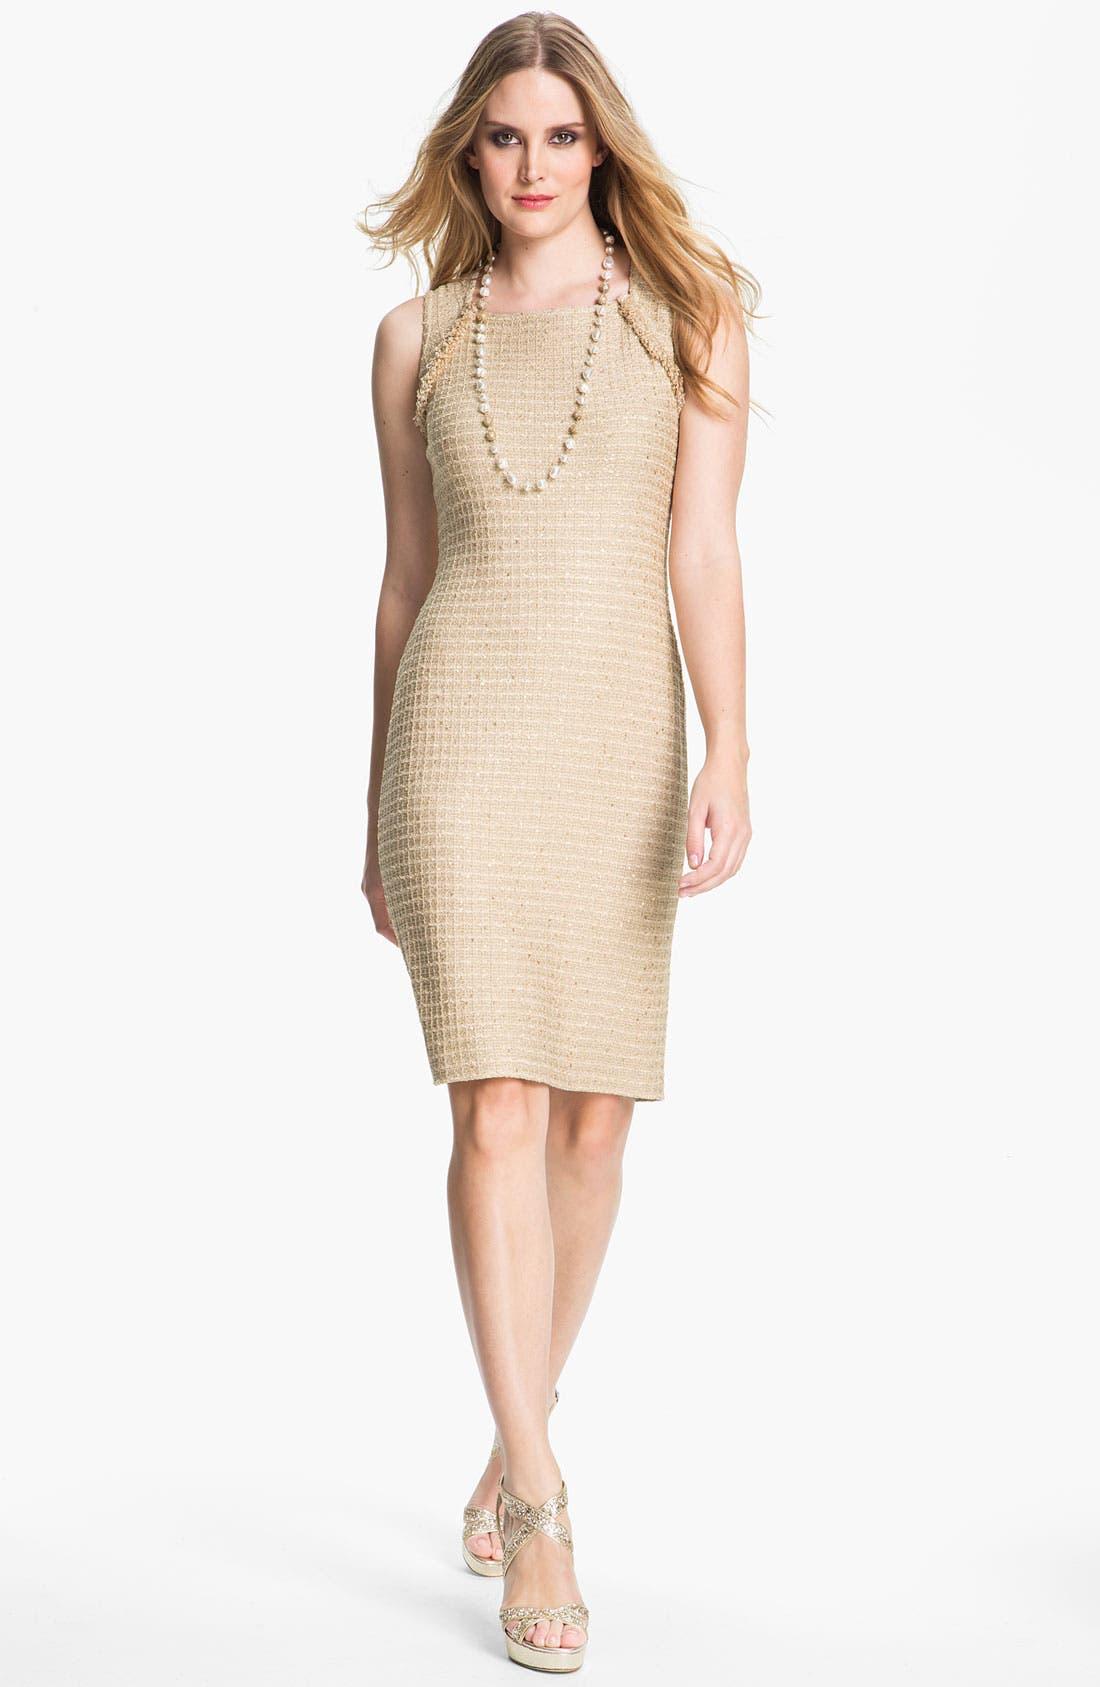 Alternate Image 1 Selected - St. John Collection Sequin Metallic Knit Dress